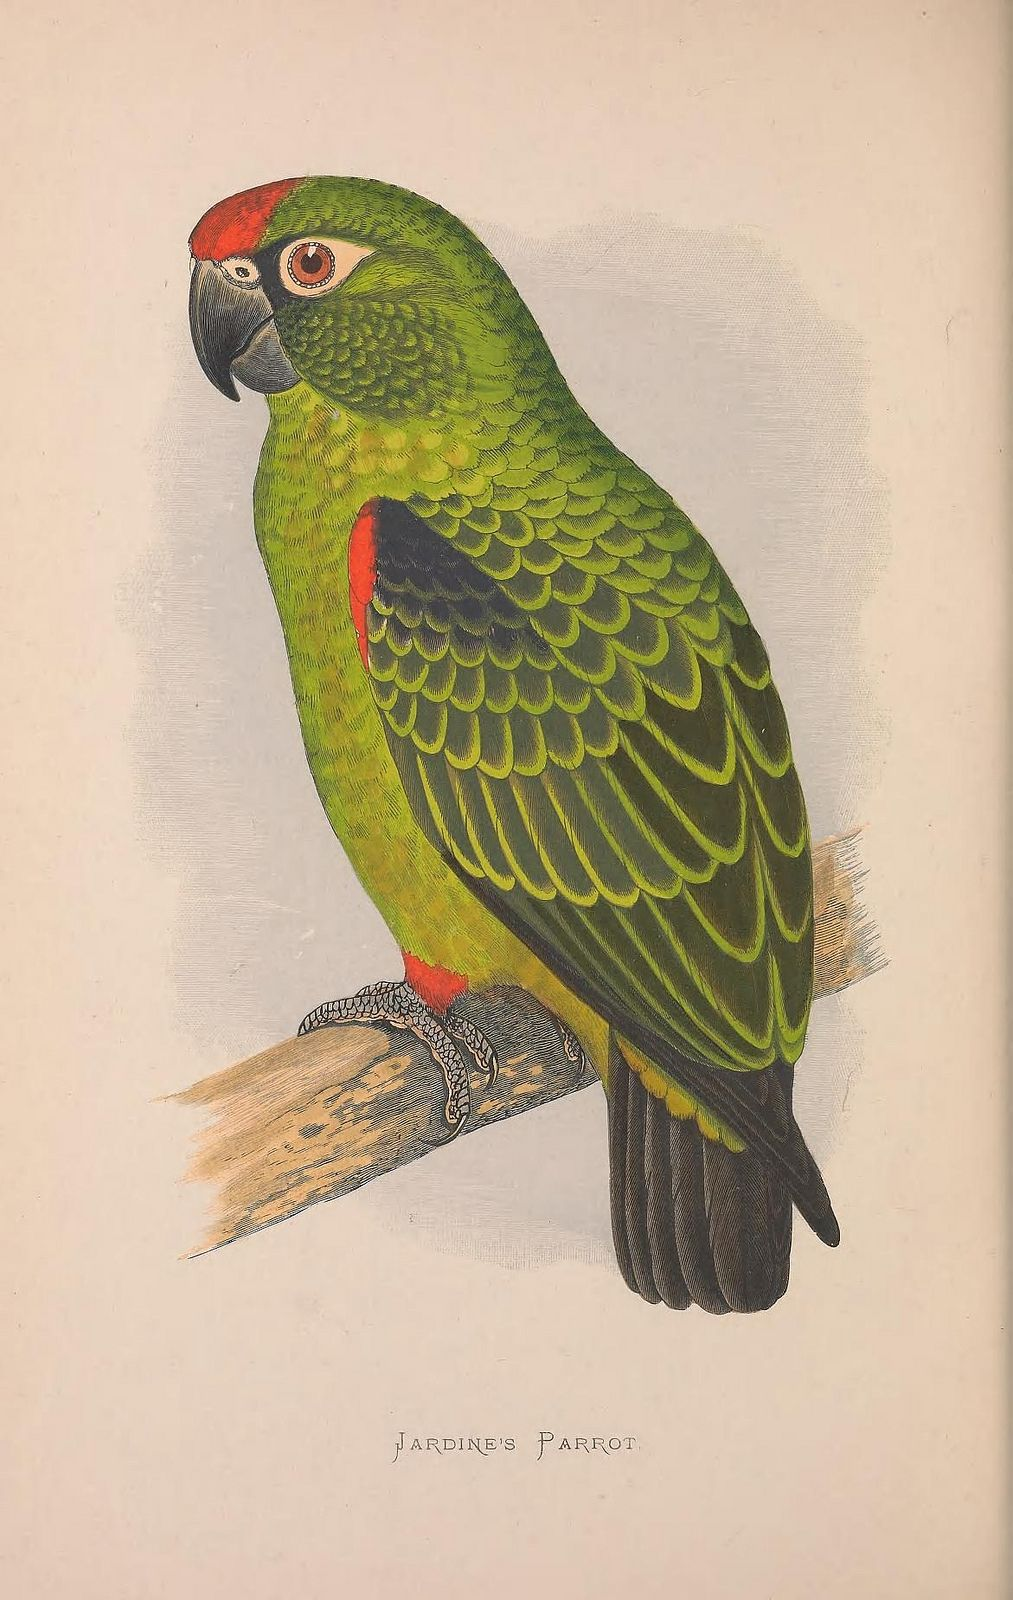 Jardine's parrot (Poicephalus gulielmi, Psittaciformes: Psittacidae: Psittacinae)